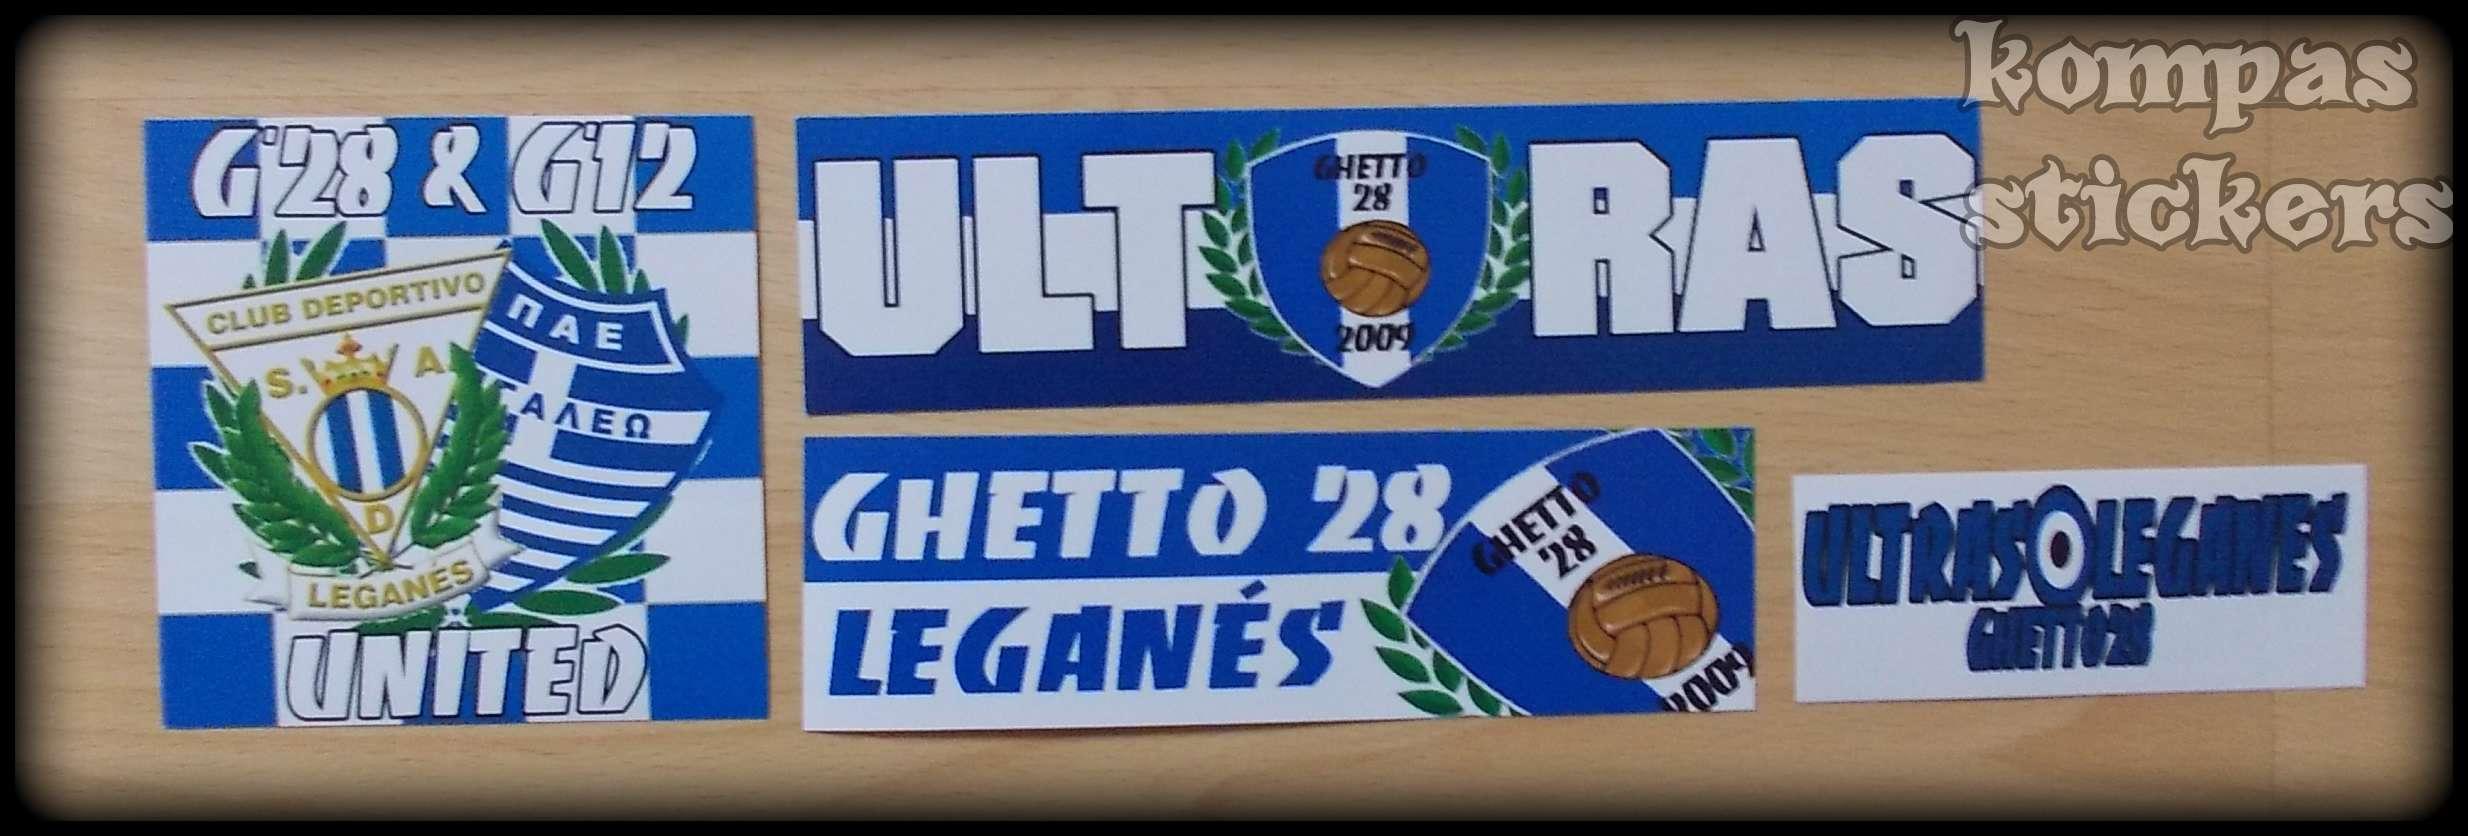 LEGANES Legane10